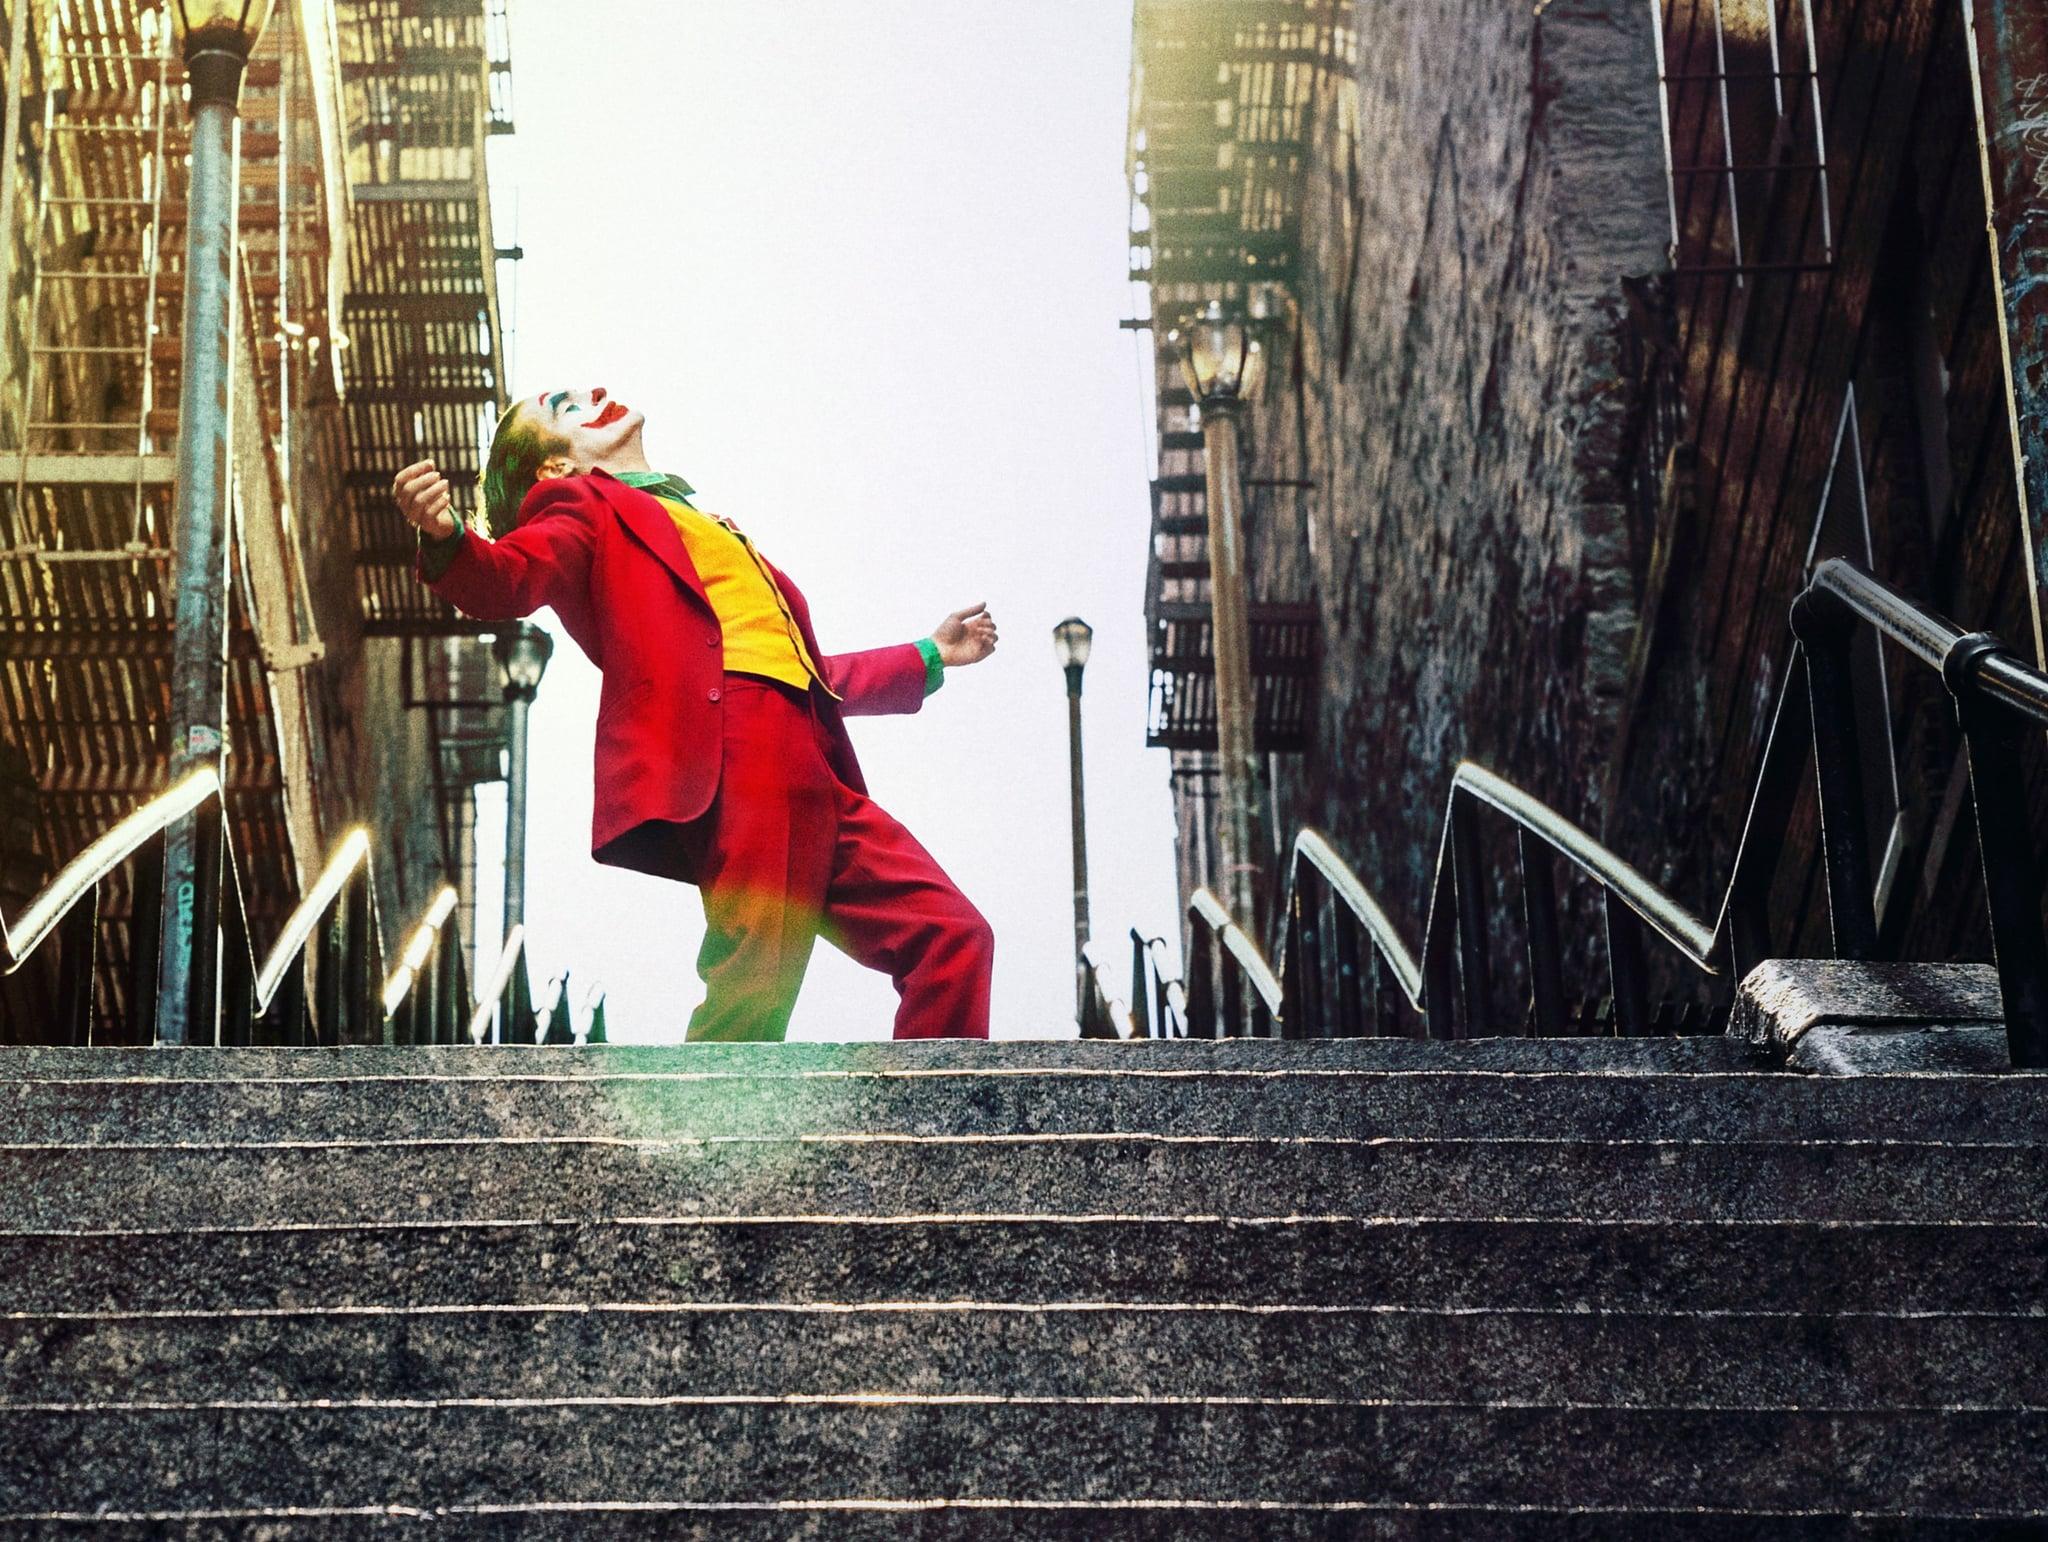 JOKER, Joaquin Phoenix as Arthur Fleck / Joker, 2019.  Warner Bros. / courtesy Everett Collection